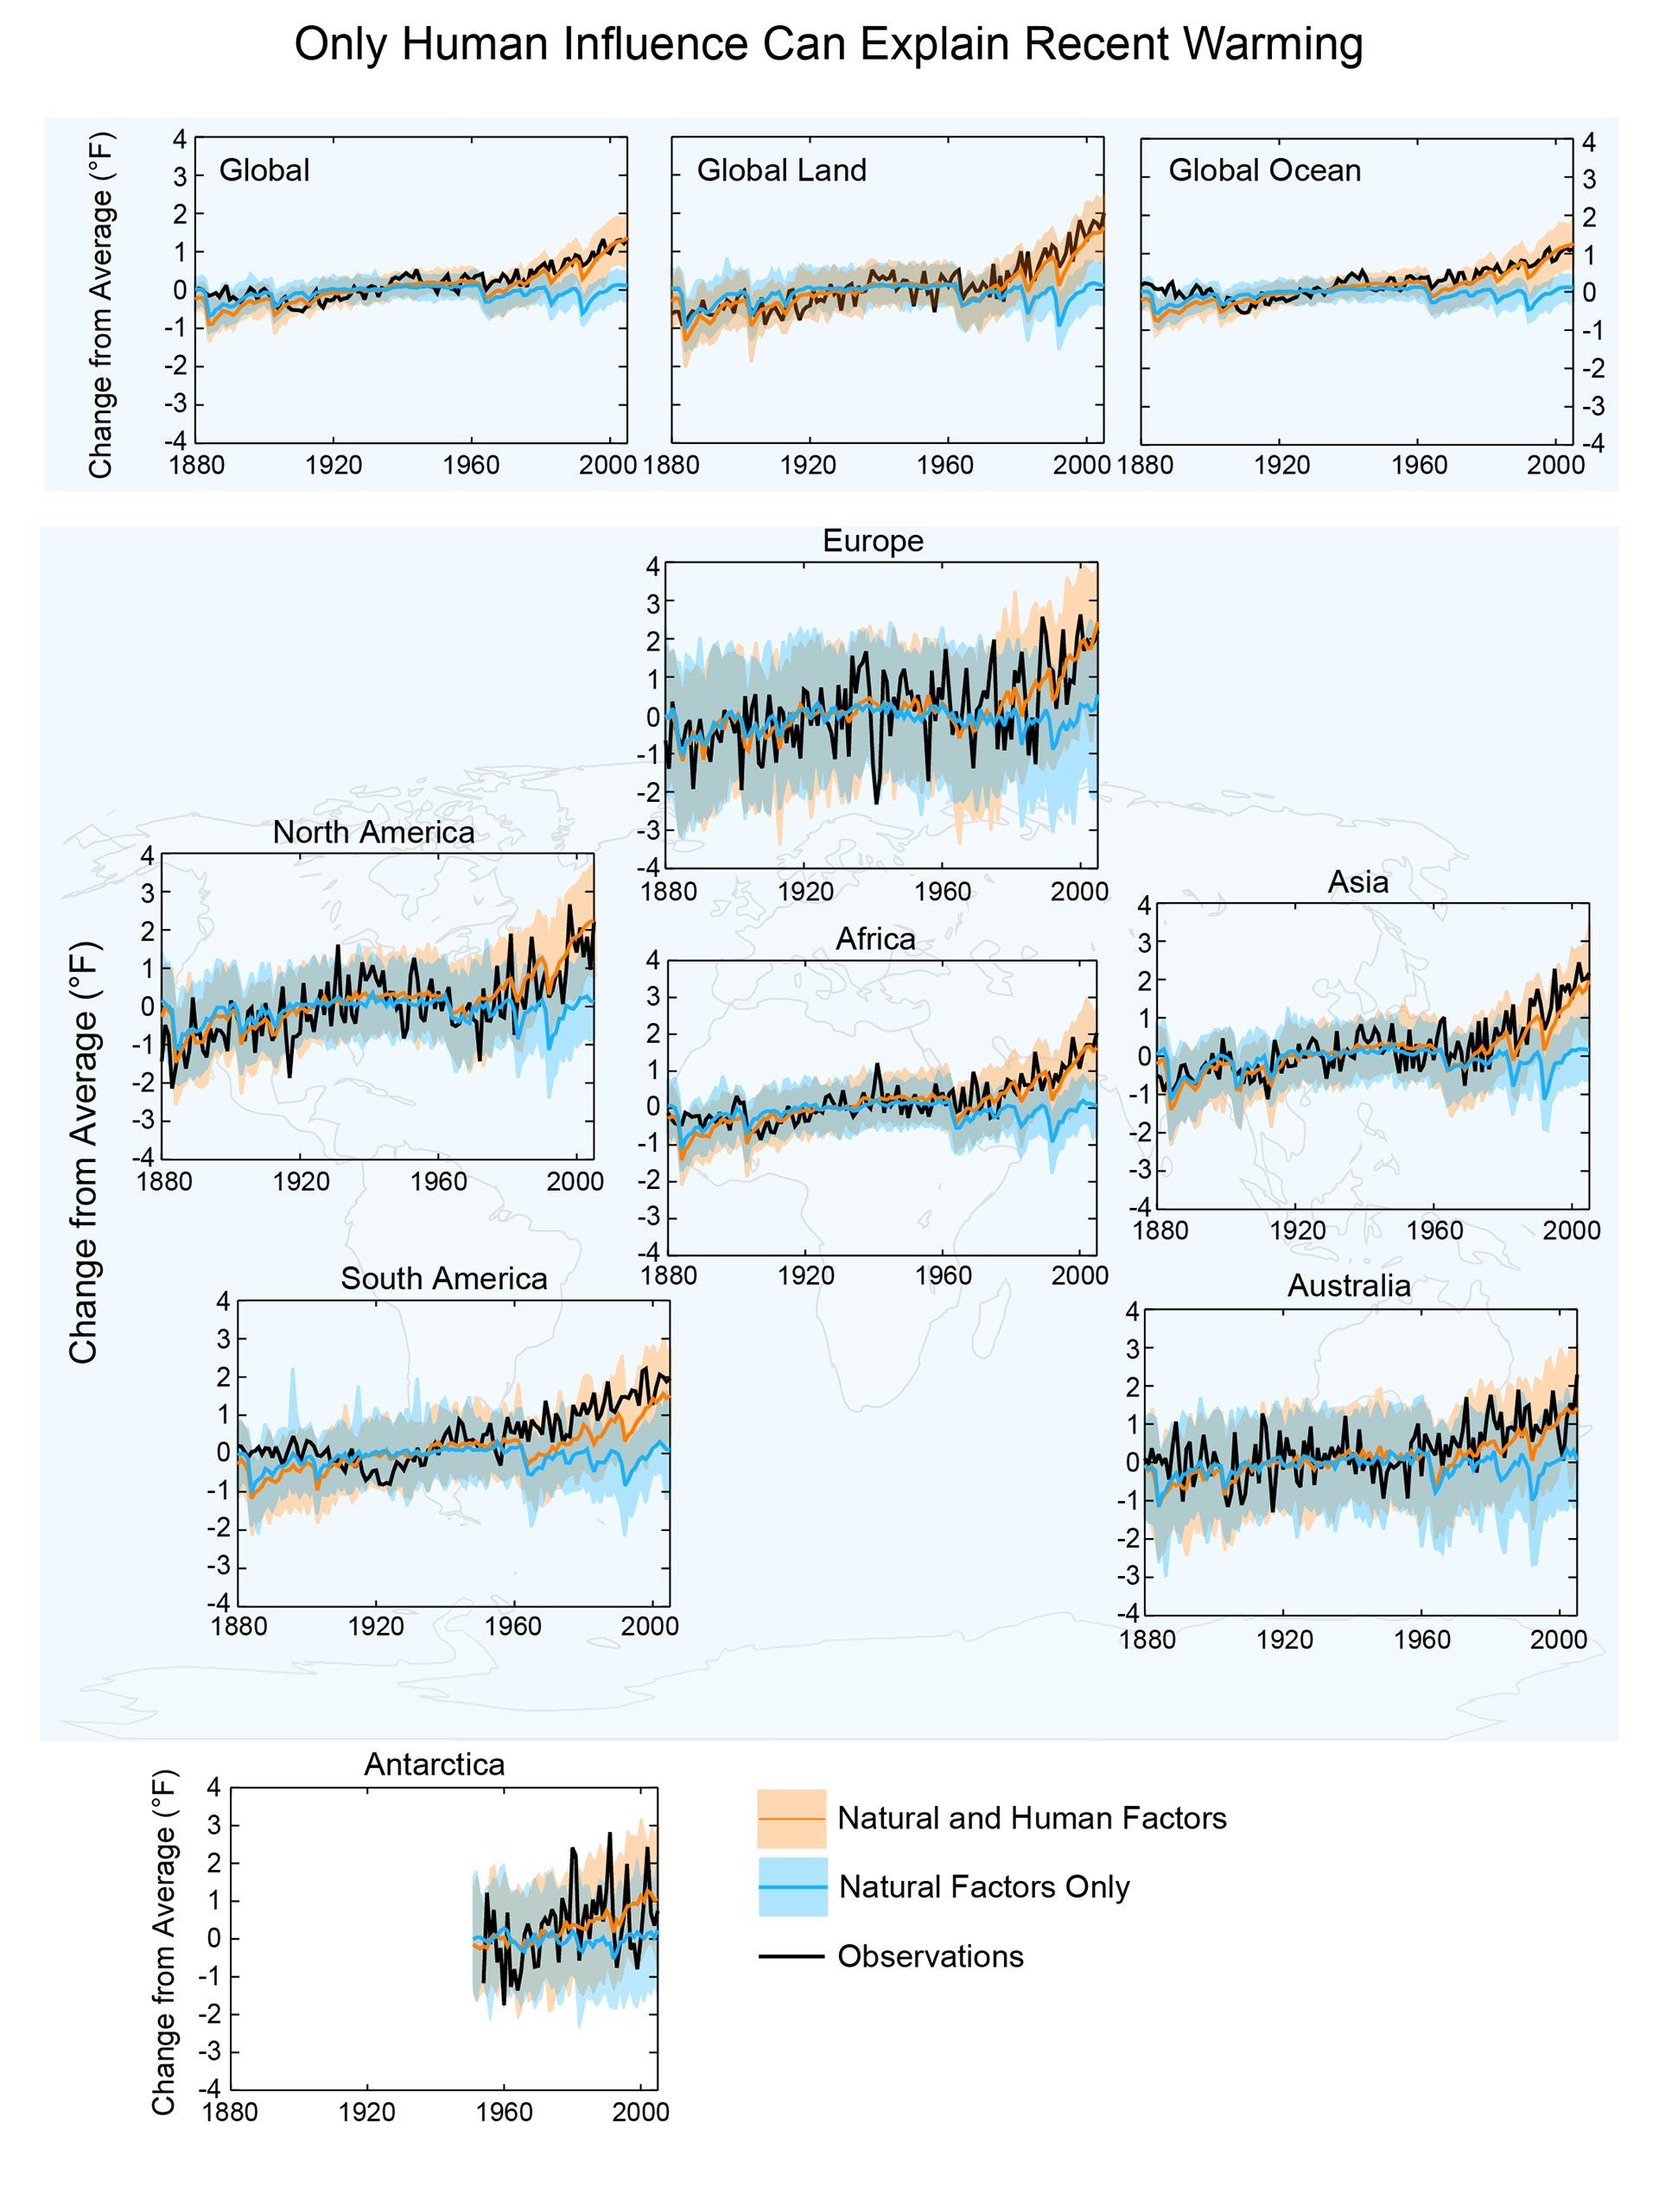 Human Impact of Global Warming